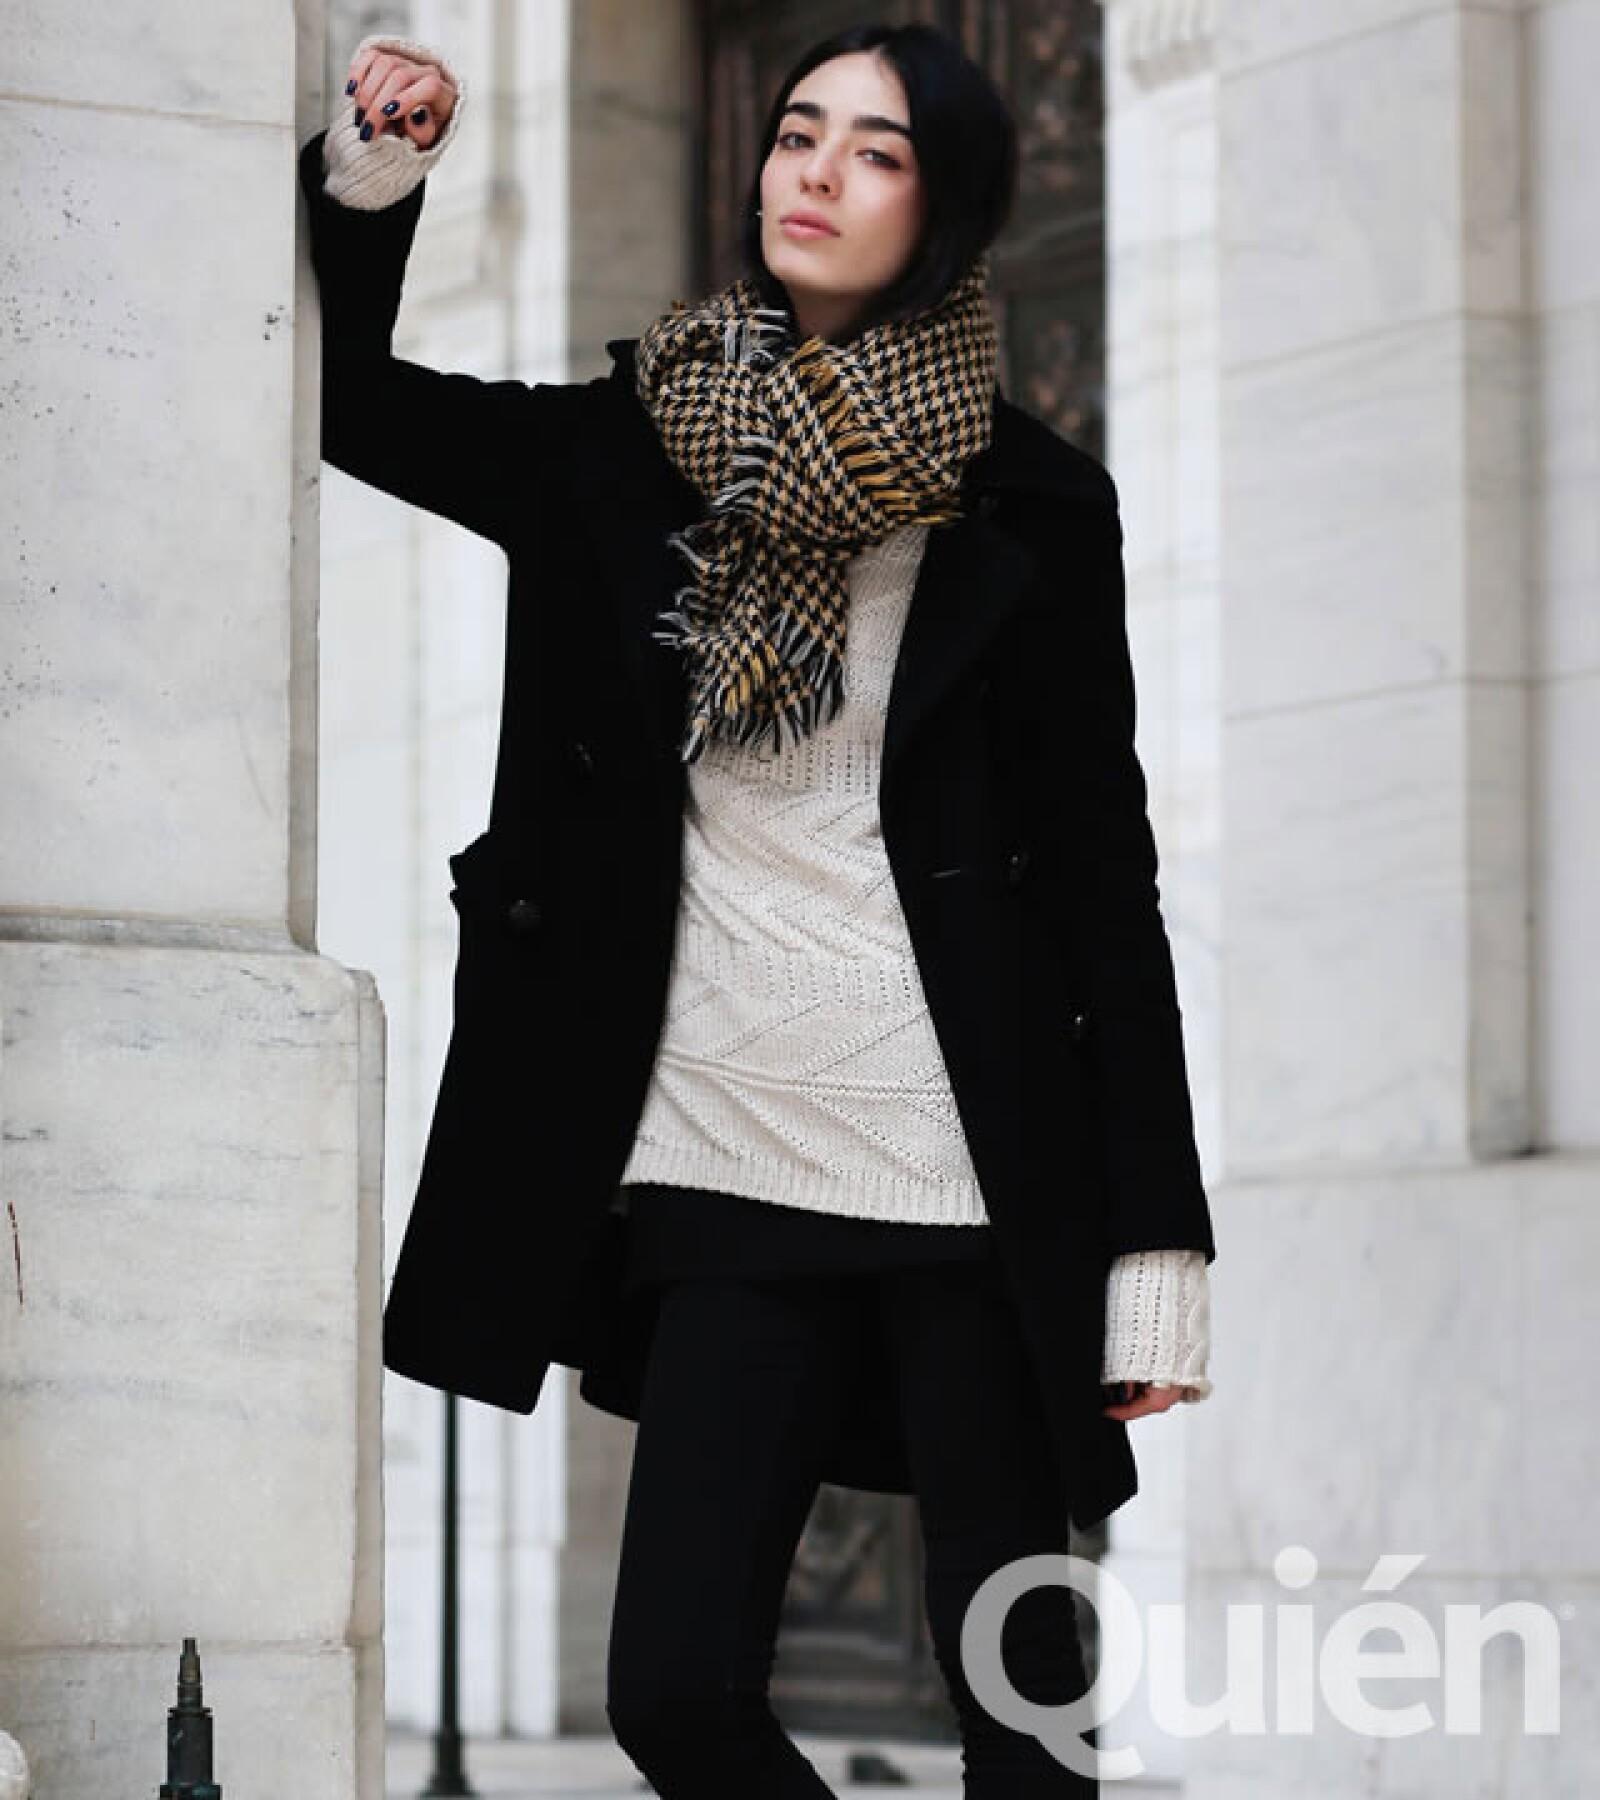 Cristina Piccone Takano, modelo. Marc Jacobs, Ruffian y Bottega Veneta la han llamado para sus desfiles.